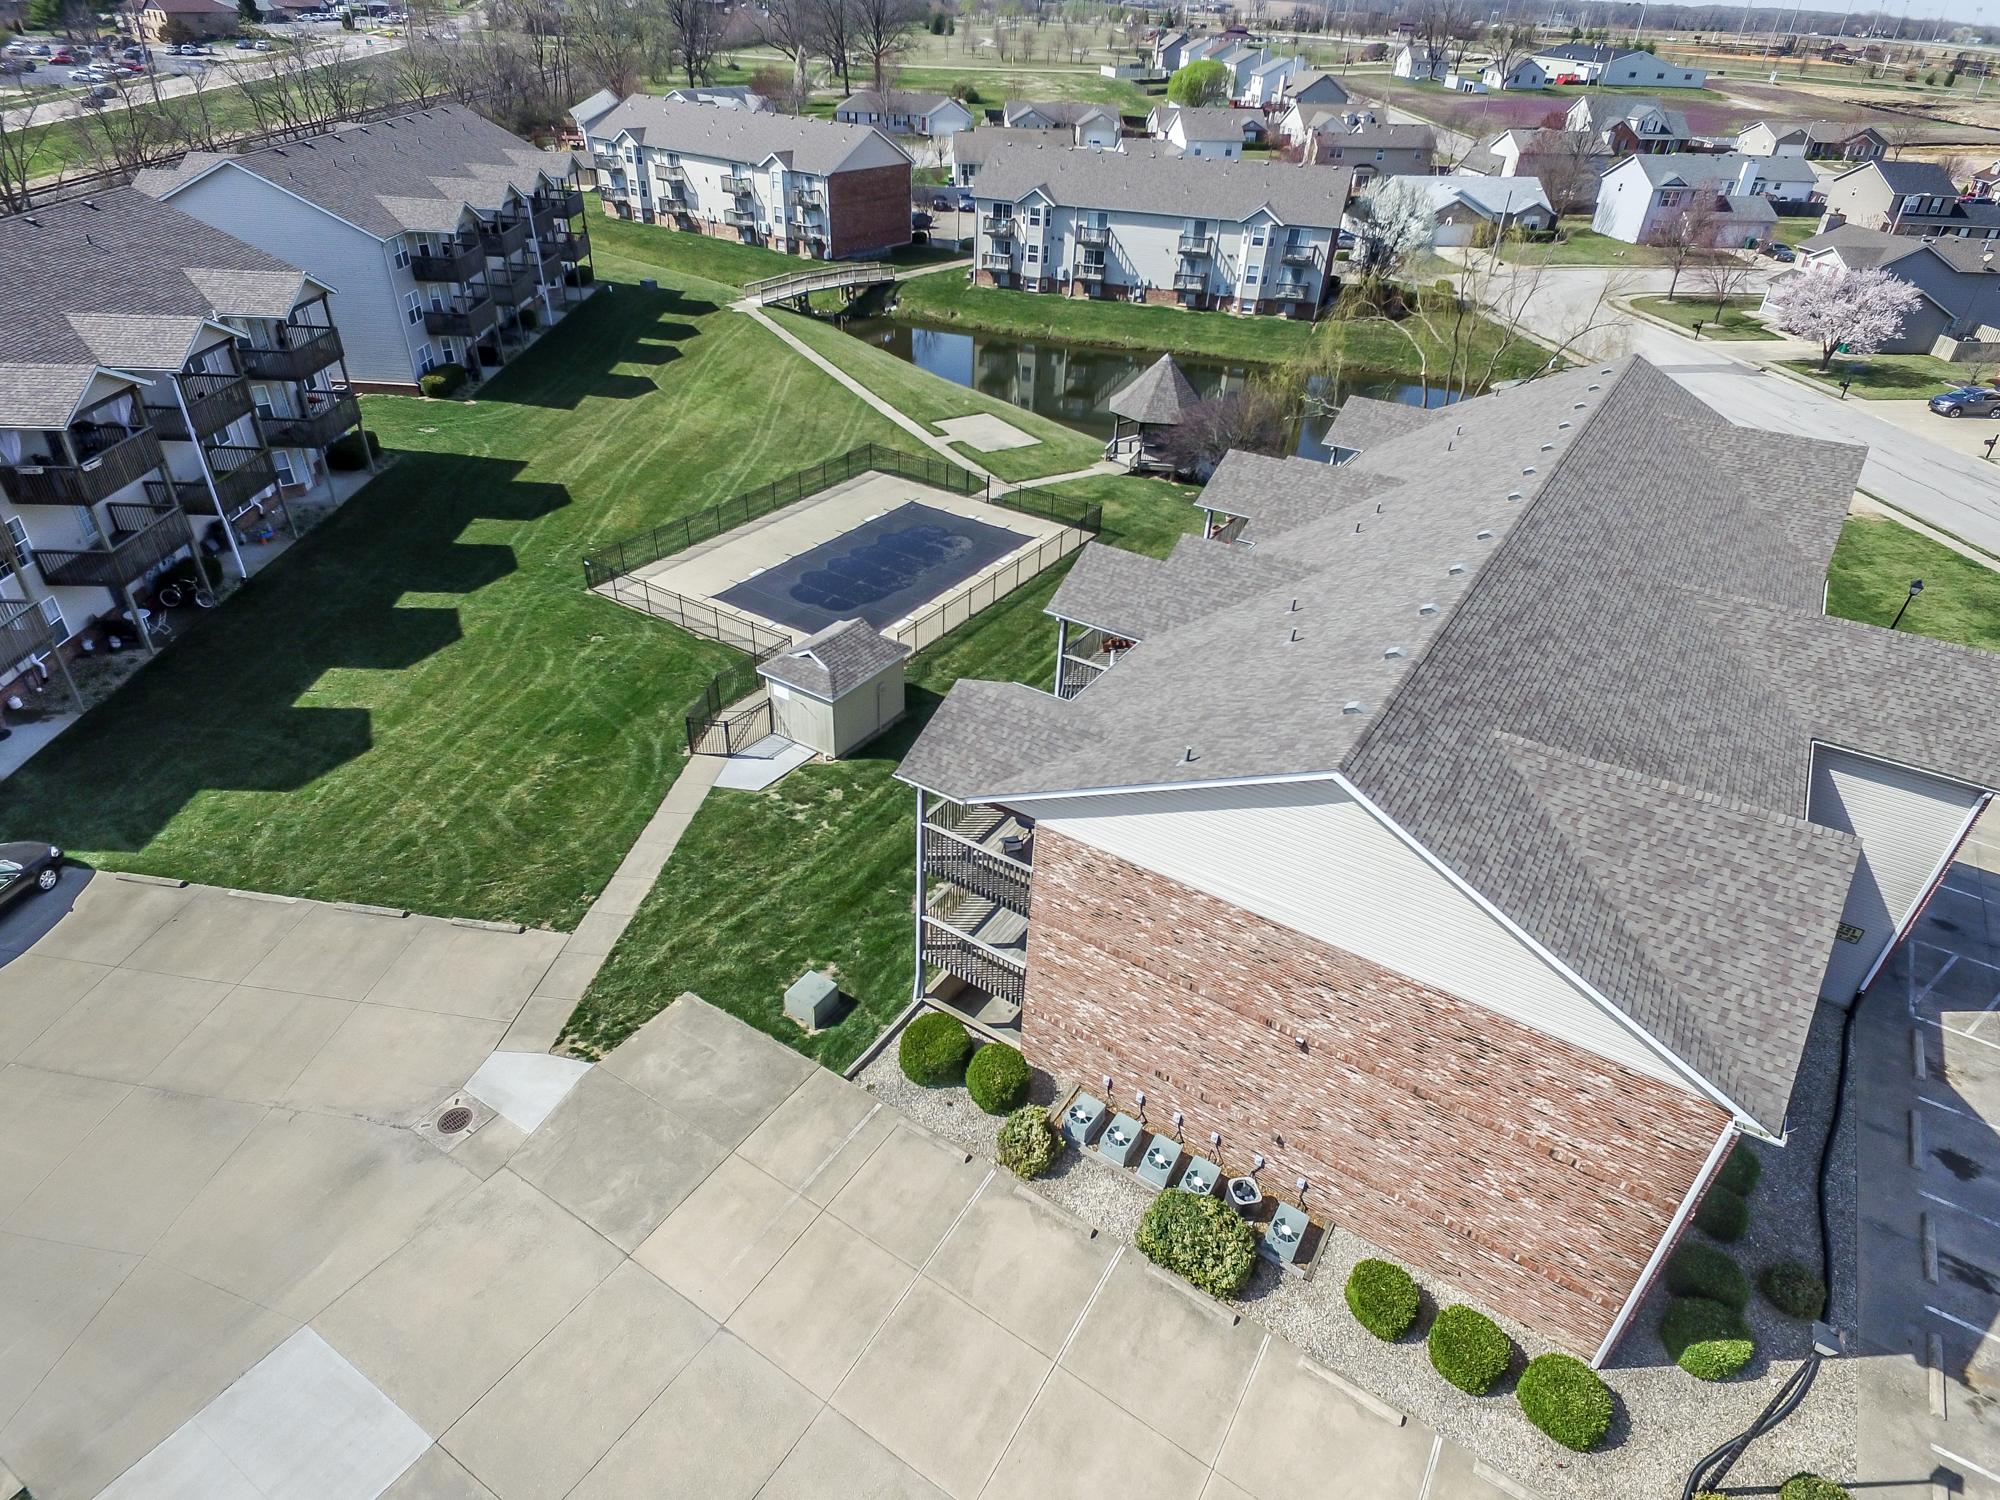 Brookside-Apartments-O'Fallon-Illinois-Aerials-4.jpg